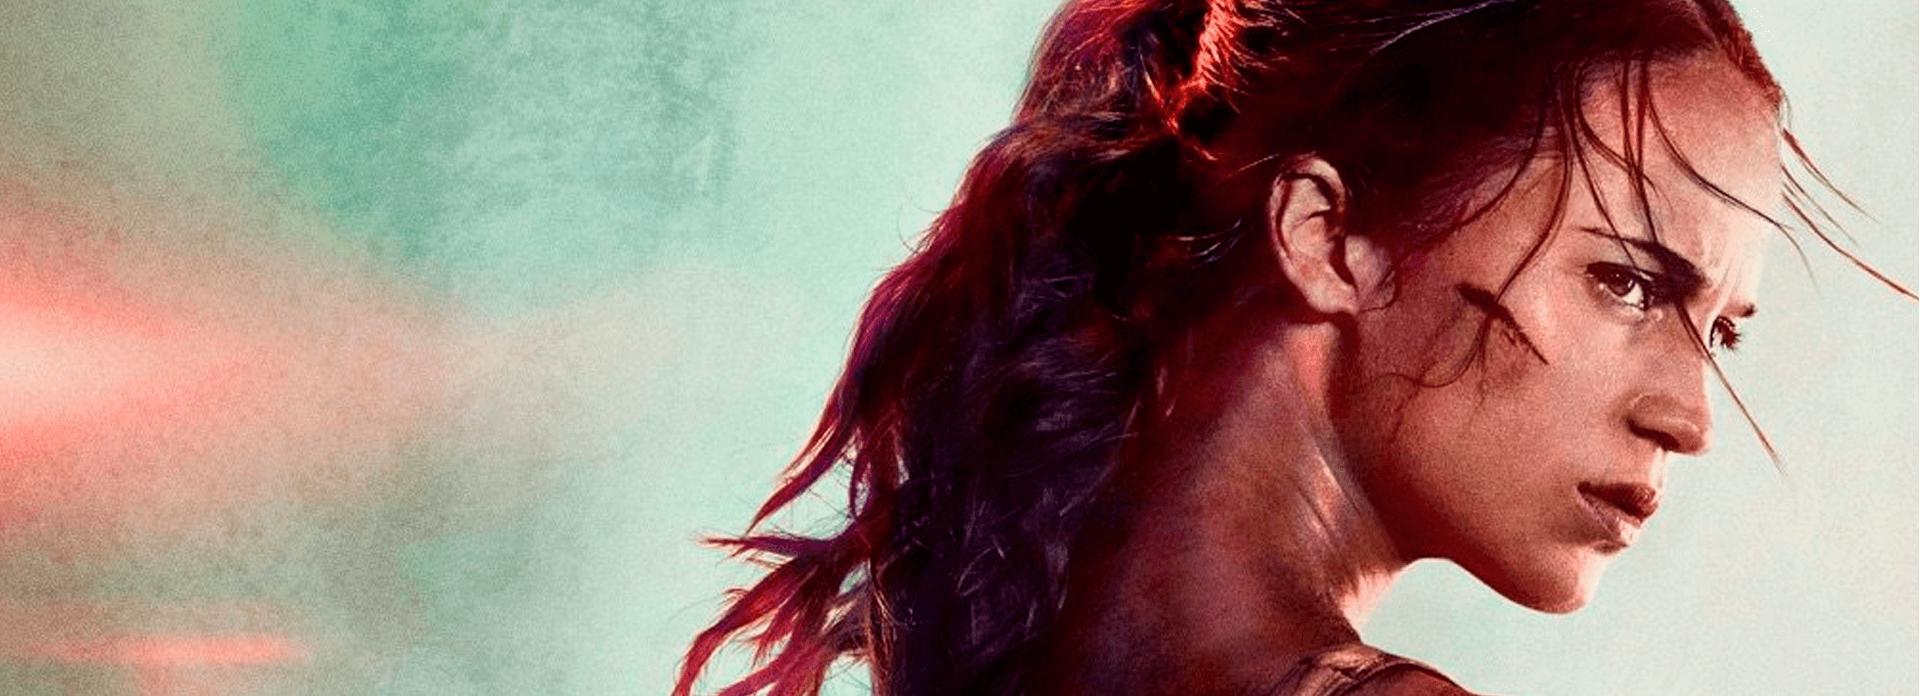 Película Tomb Raider